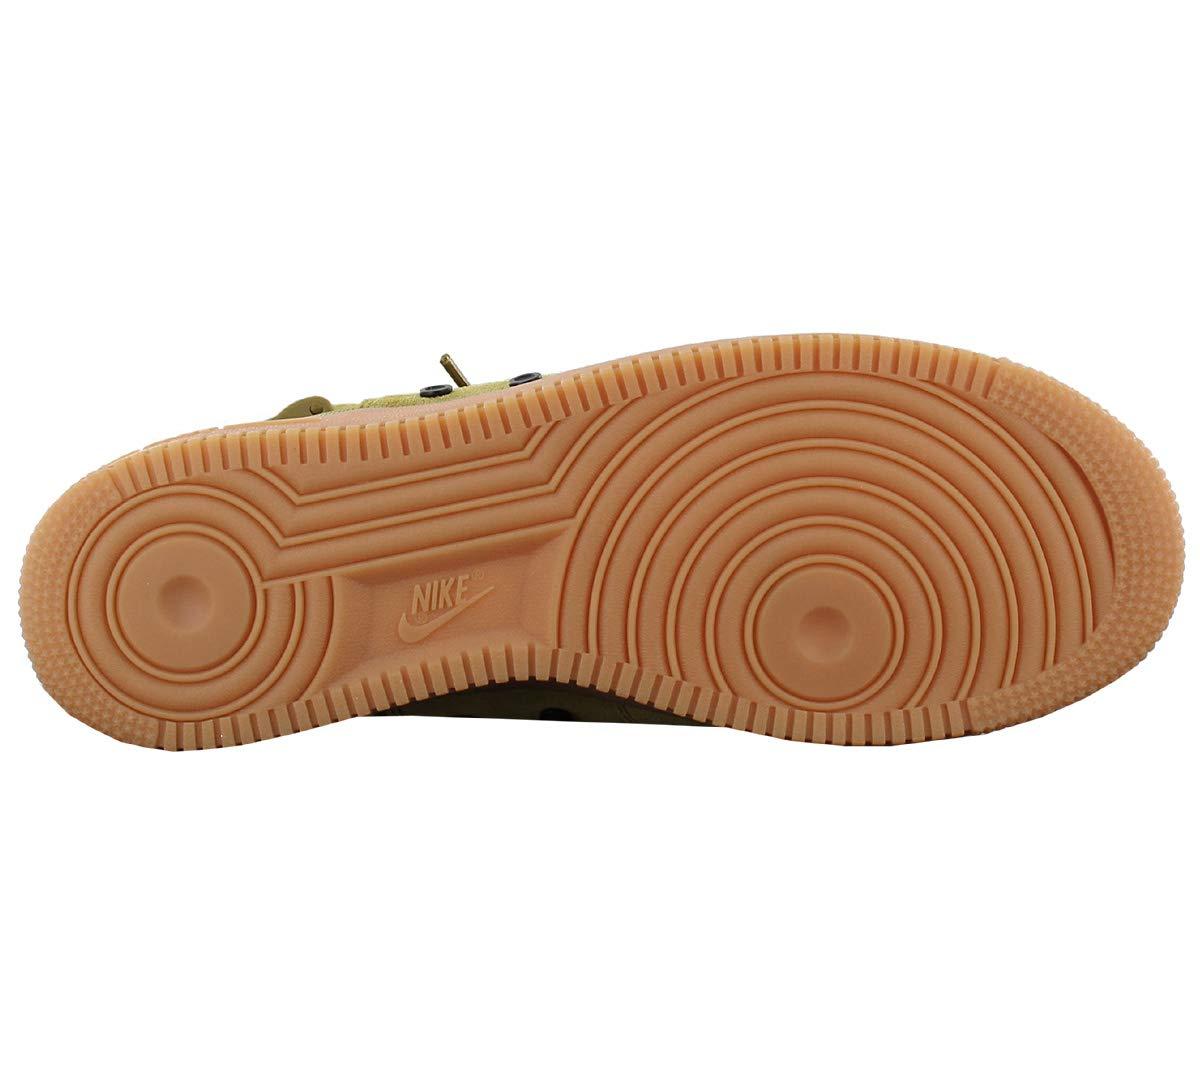 61dMc NEB4L - Nike Men's Sf Af1 Mid Gymnastics Shoes